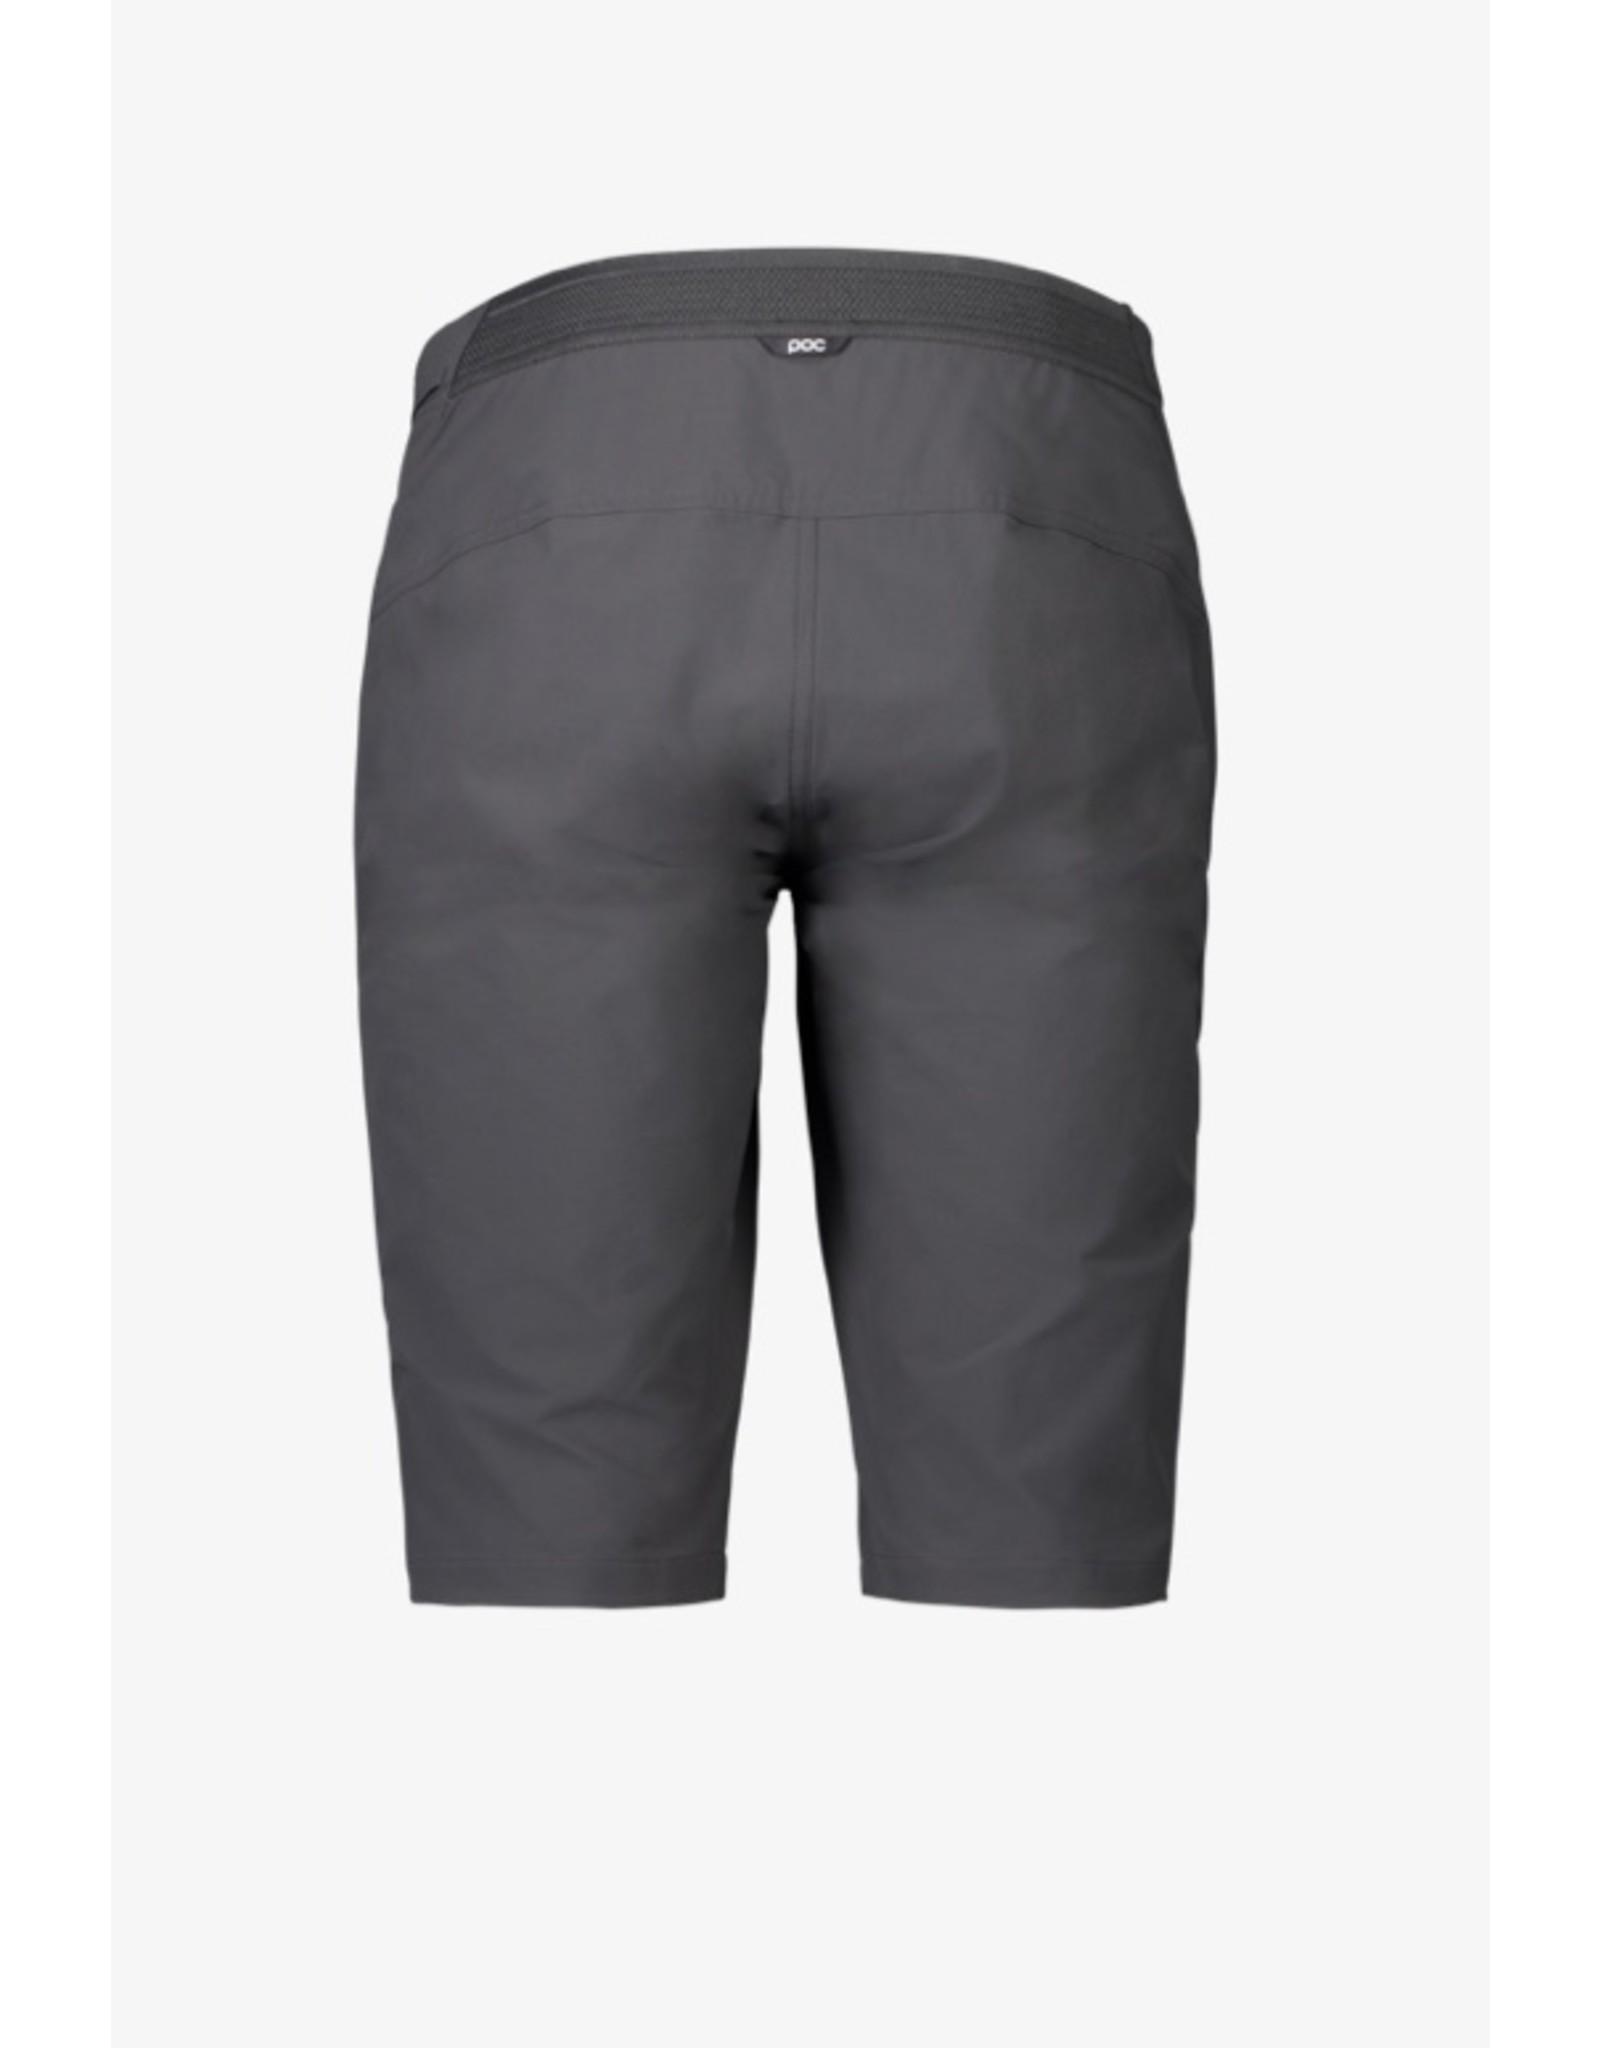 POC POC Essential Enduro Shorts Sylvanite Grey